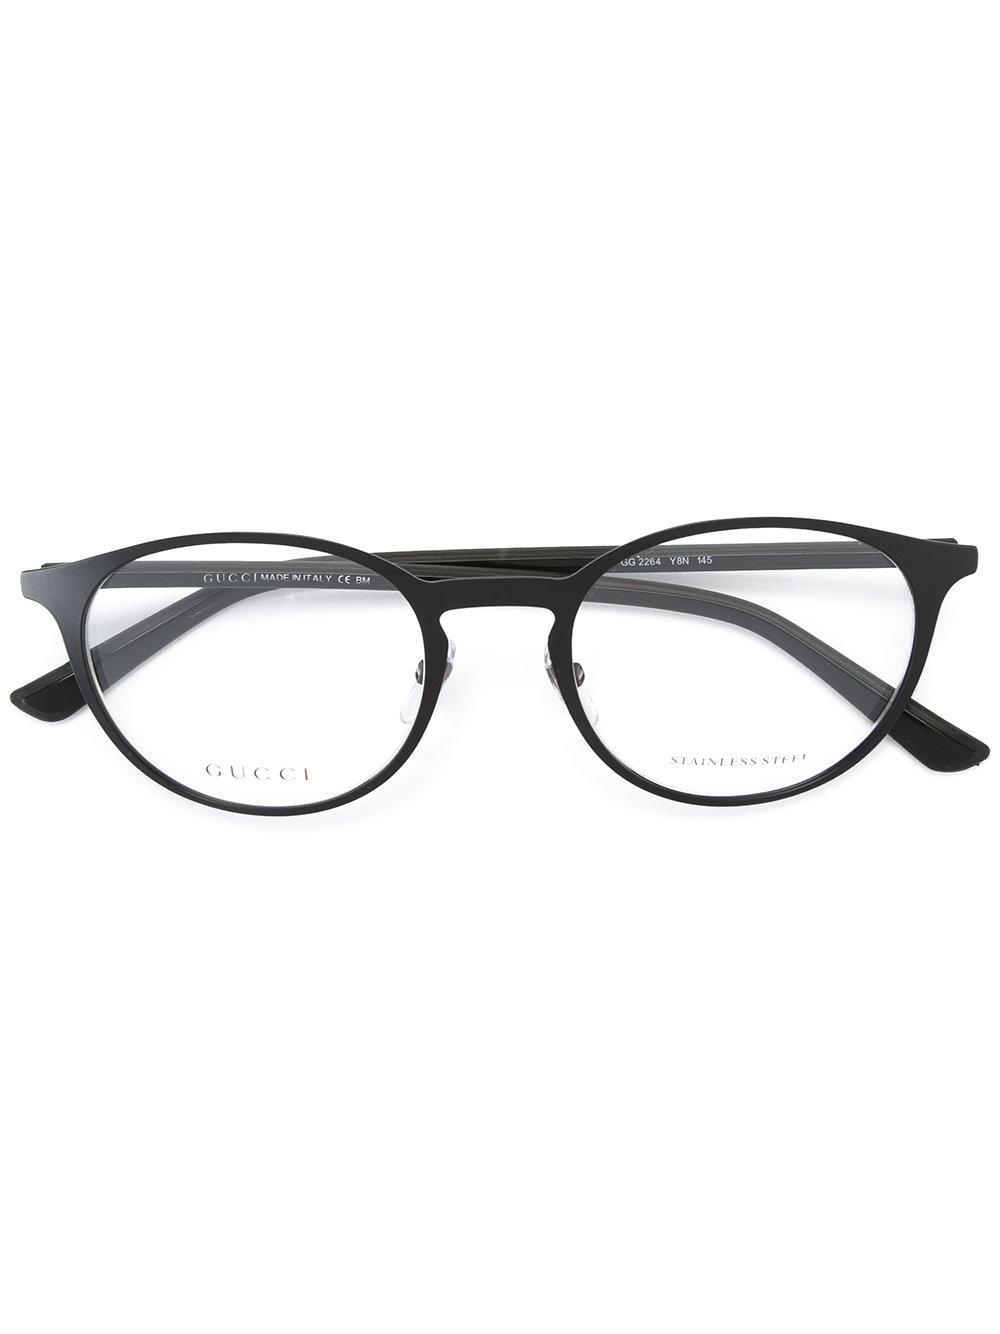 Gucci Eye Cat Shaped Glasses in Black Lyst